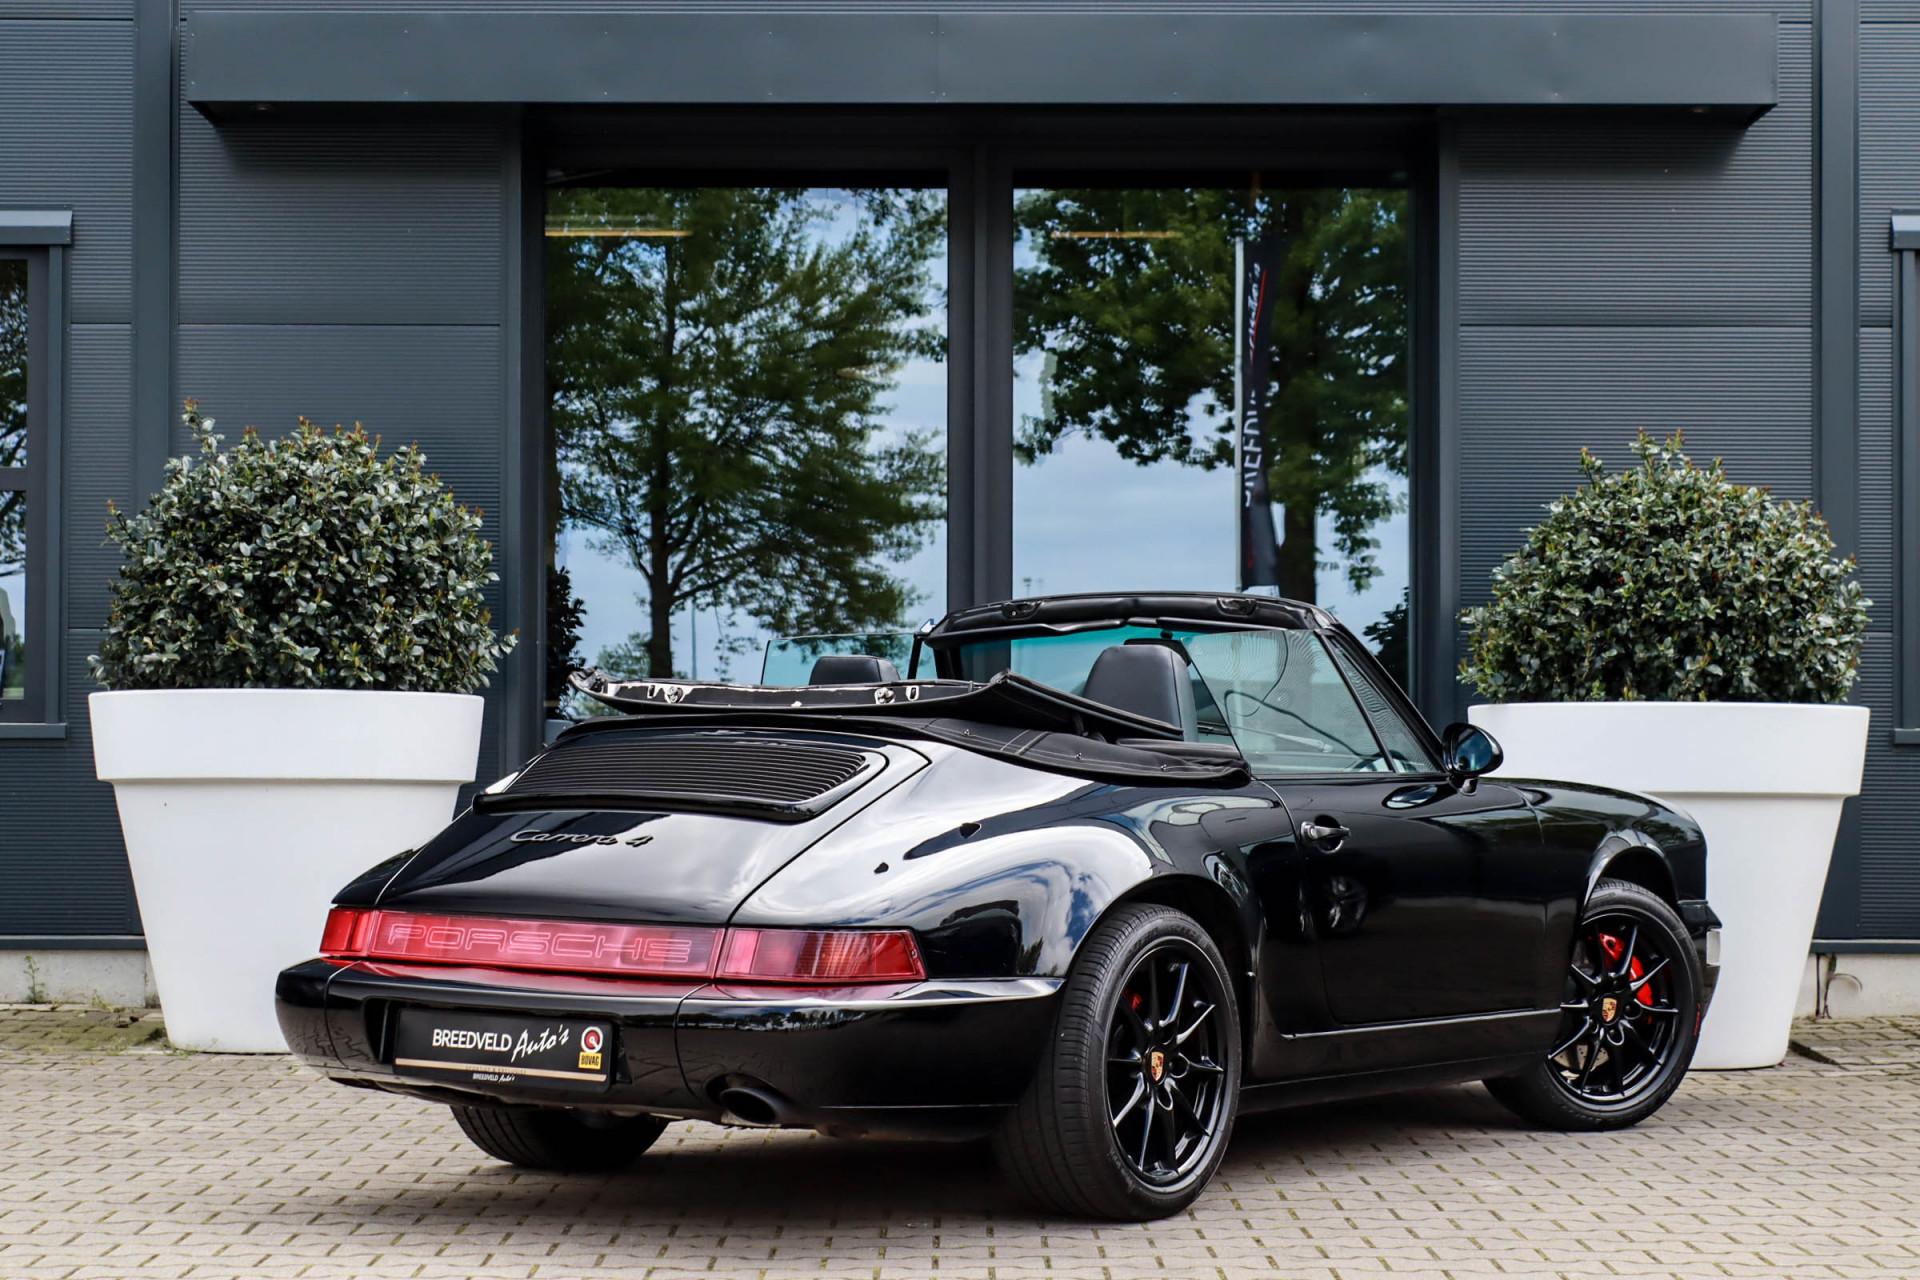 Tweedehands Porsche 911 Cabrio 1991 occasion